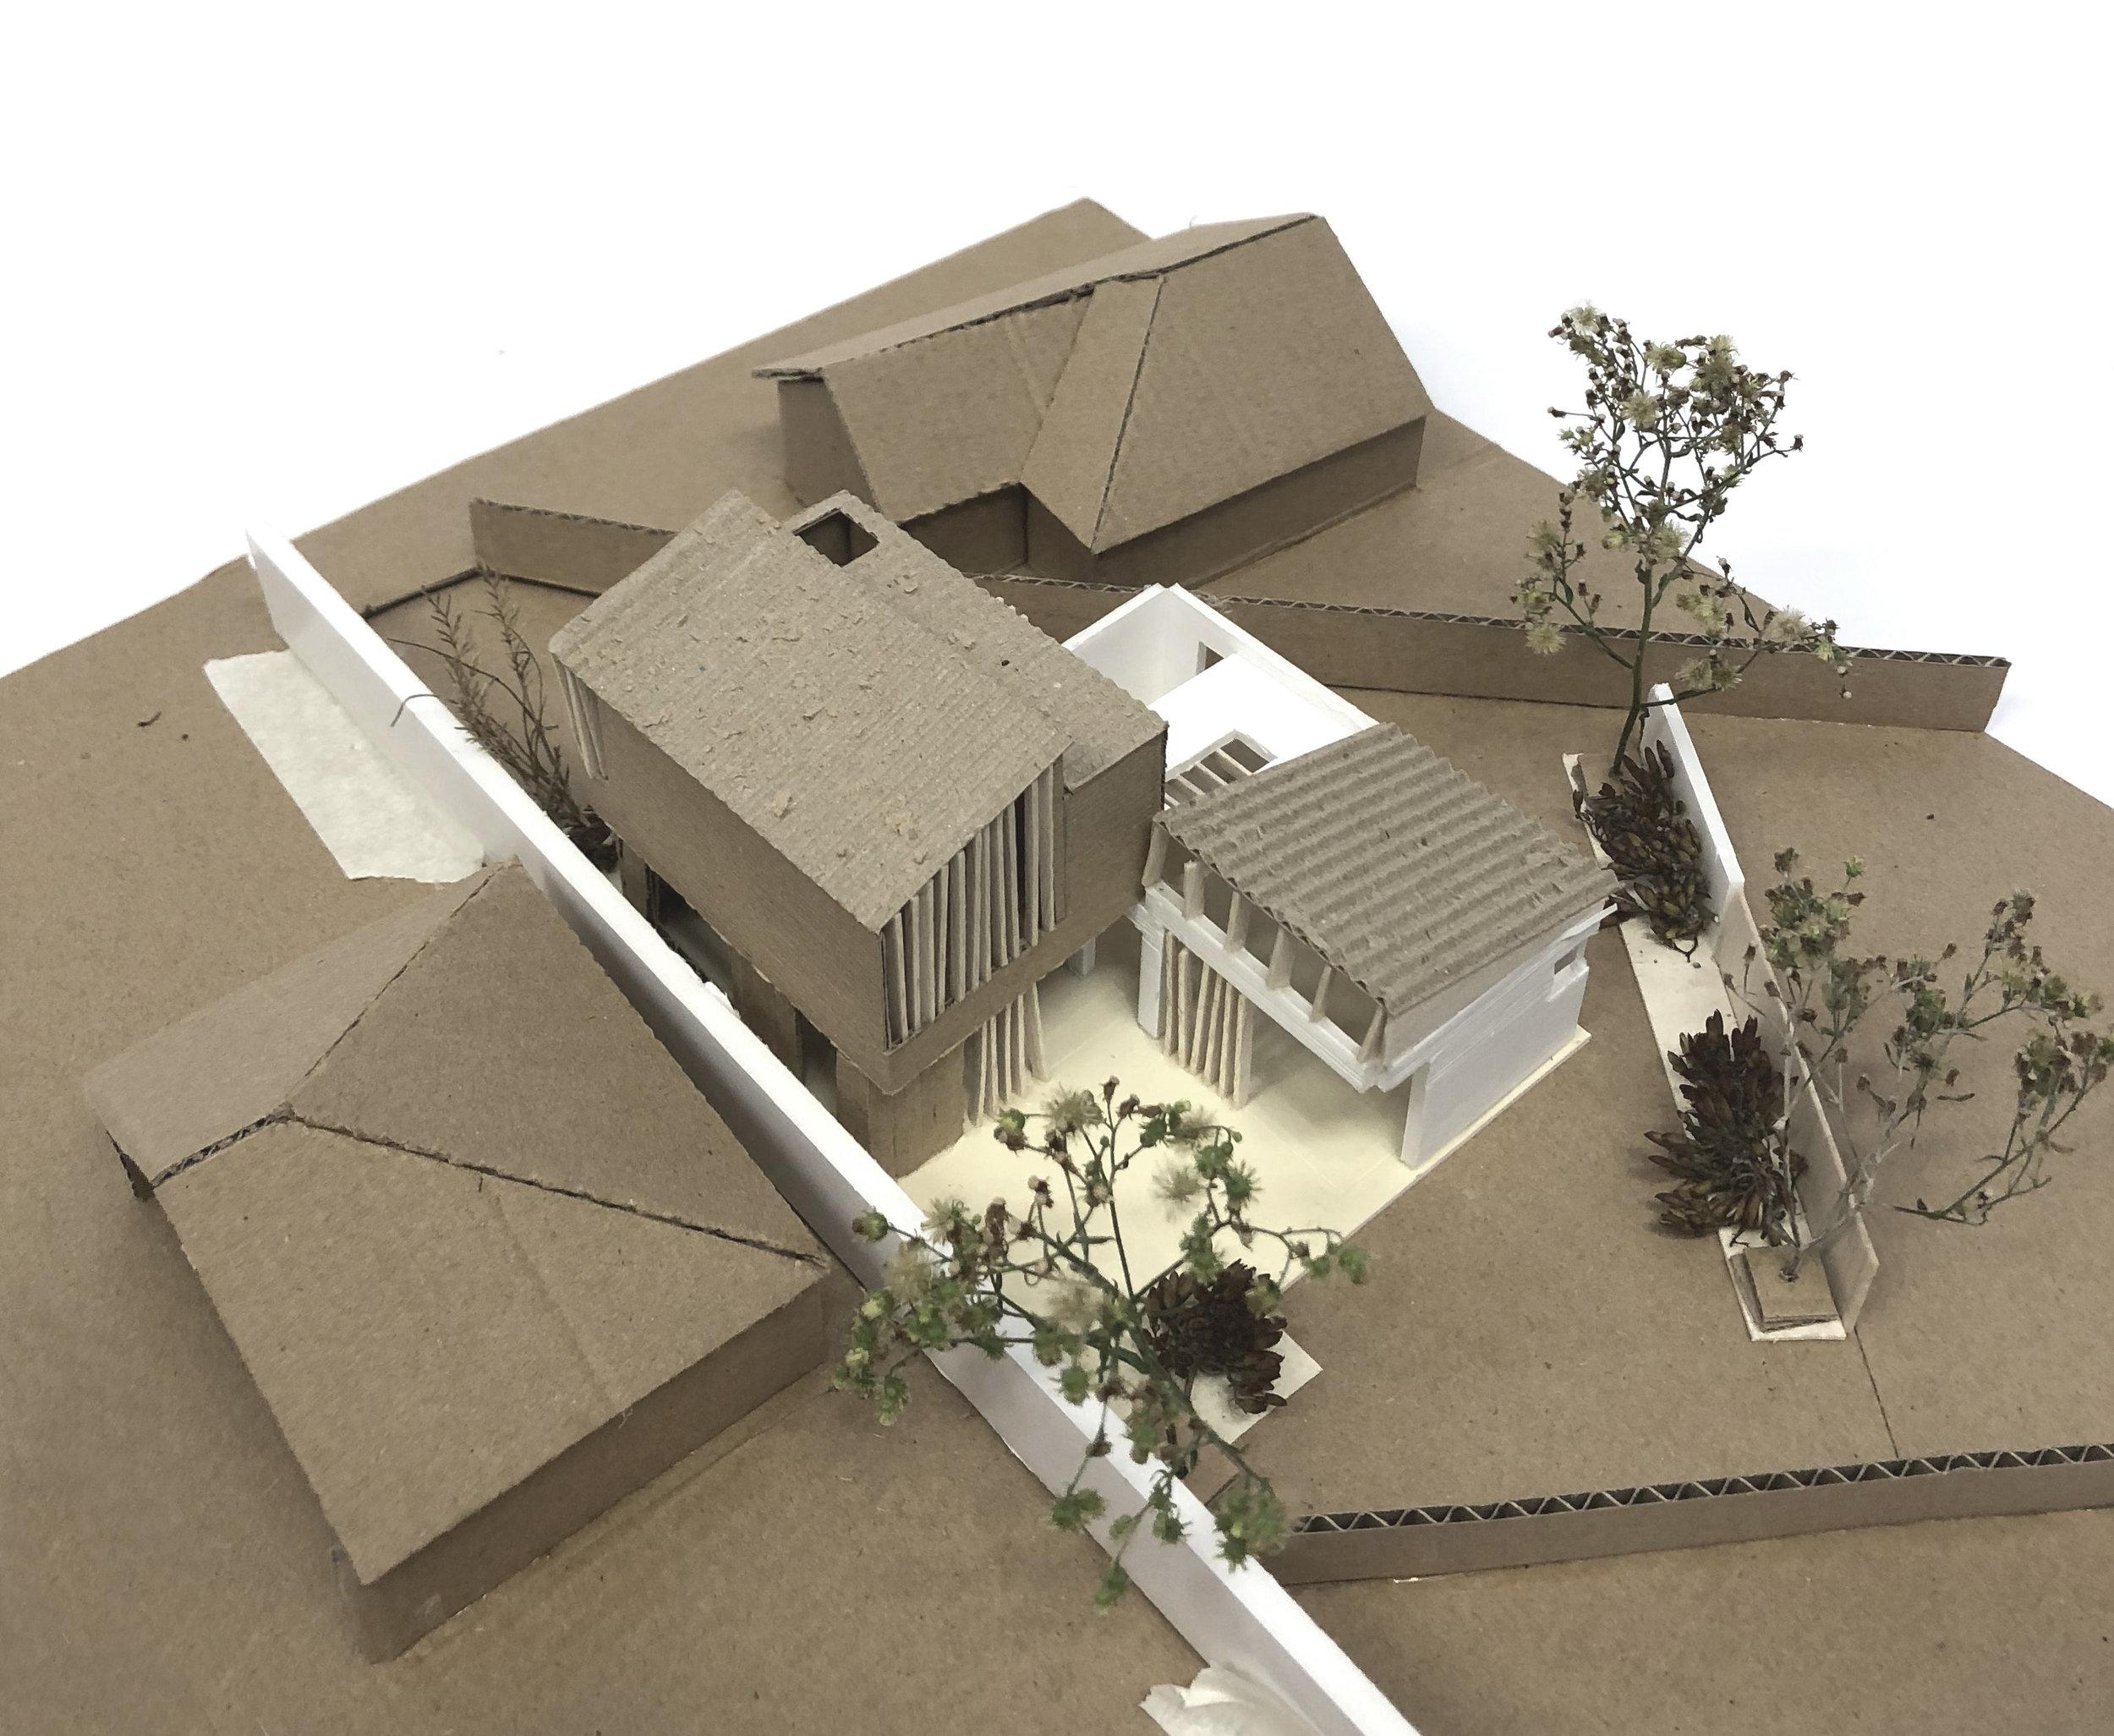 BRENNAN_FURLONG_MEWS_HOUSE_MODEL_CLONTARF (2).jpg